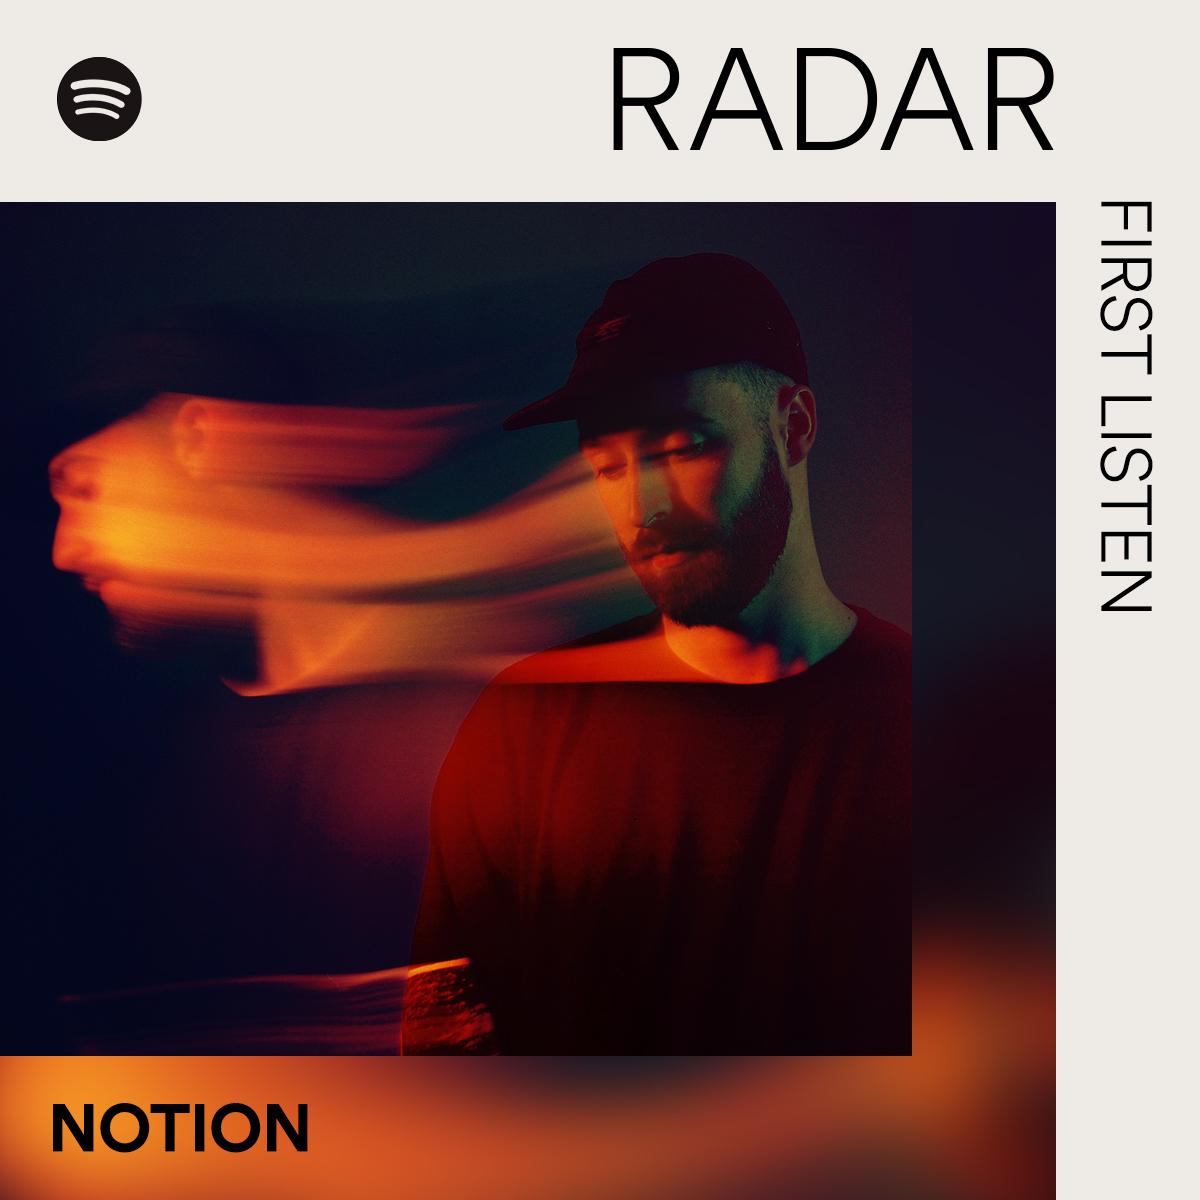 BURNING 🔥, the new track from @NotionDJ is this week's #RADAR: First Listen spoti.fi/FirstListen